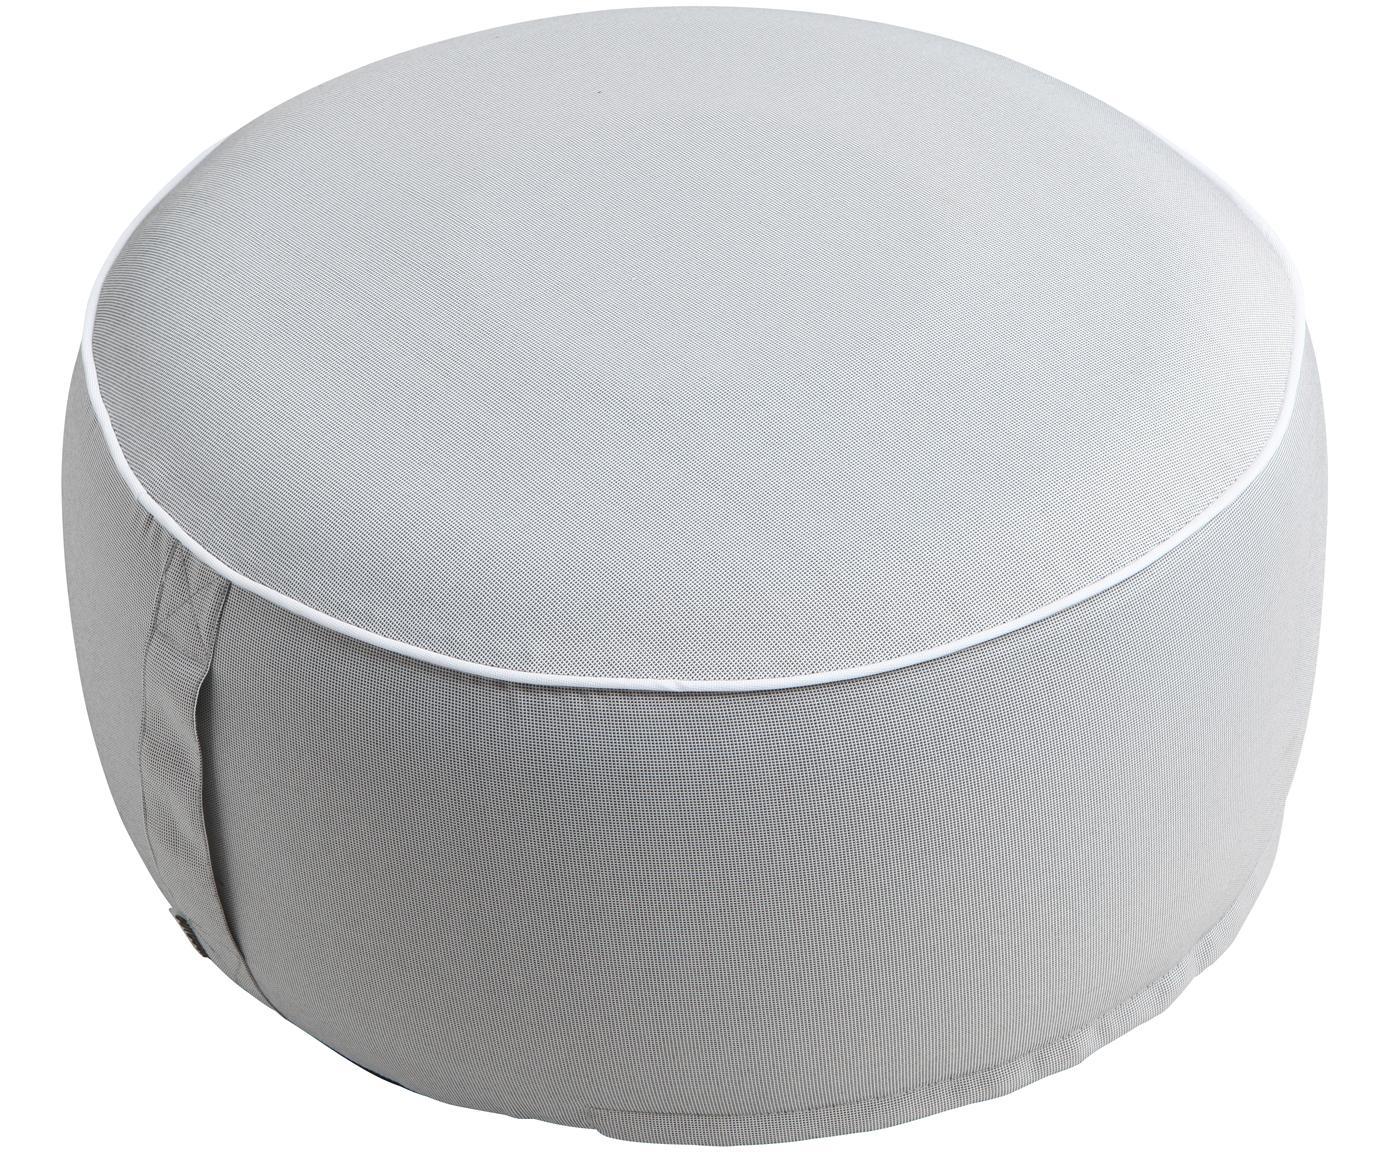 Puf de exterior Maxime, Funda: poliéster, resistente a l, Gris claro, negro, Ø 55 x Al 25 cm